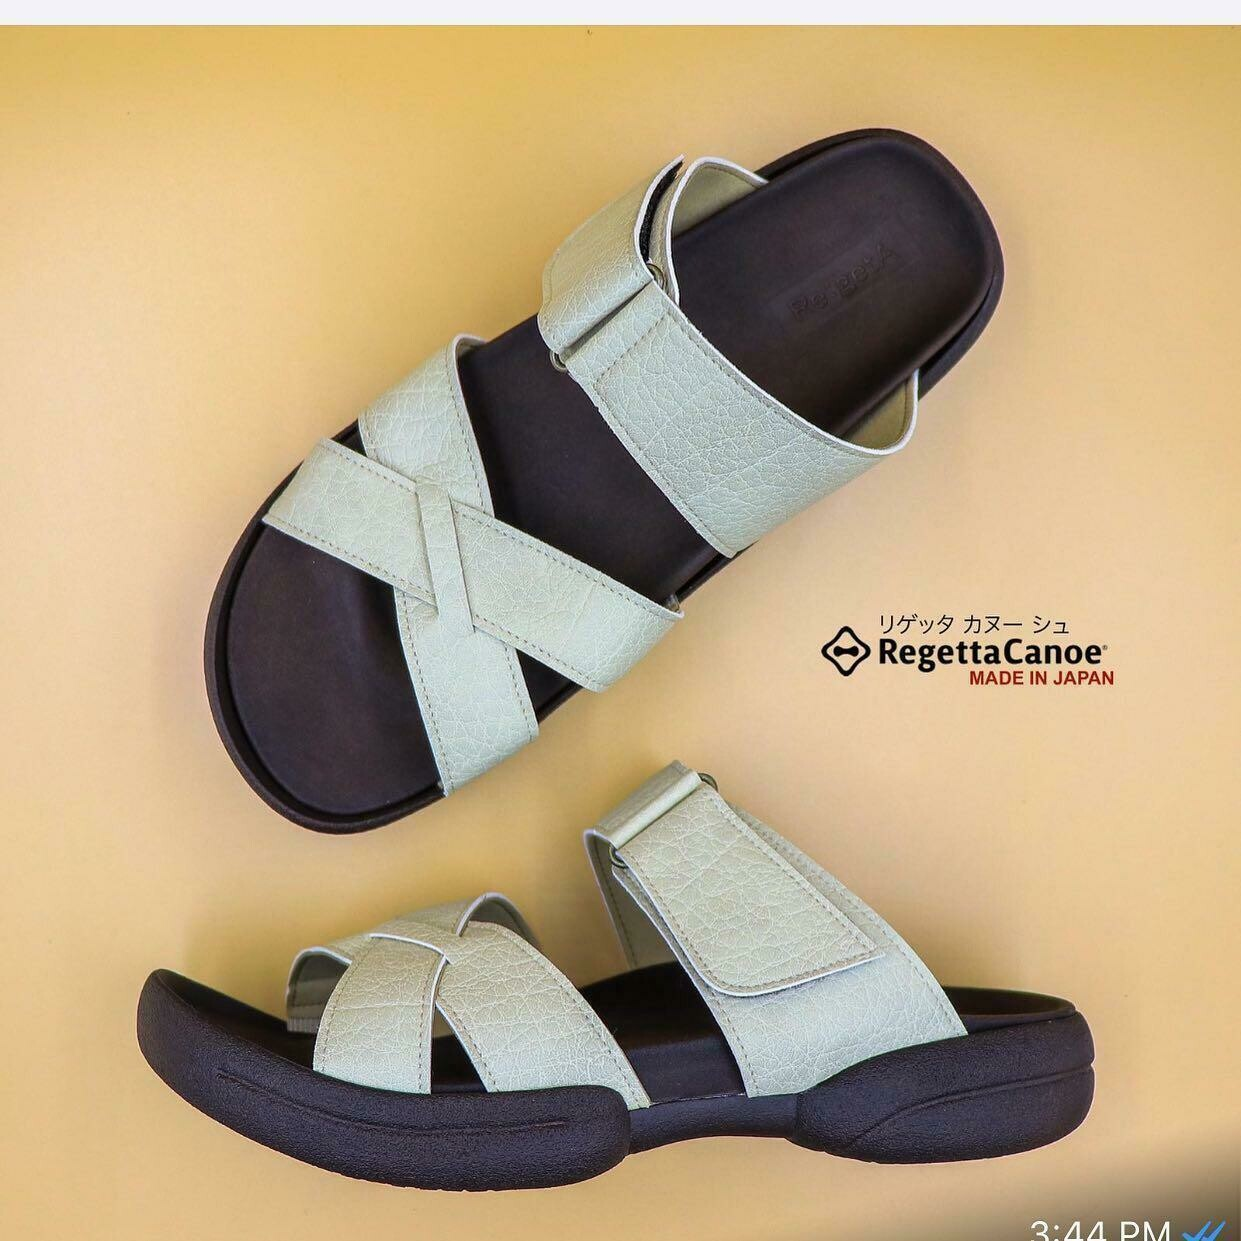 Regetta Canoe sandals